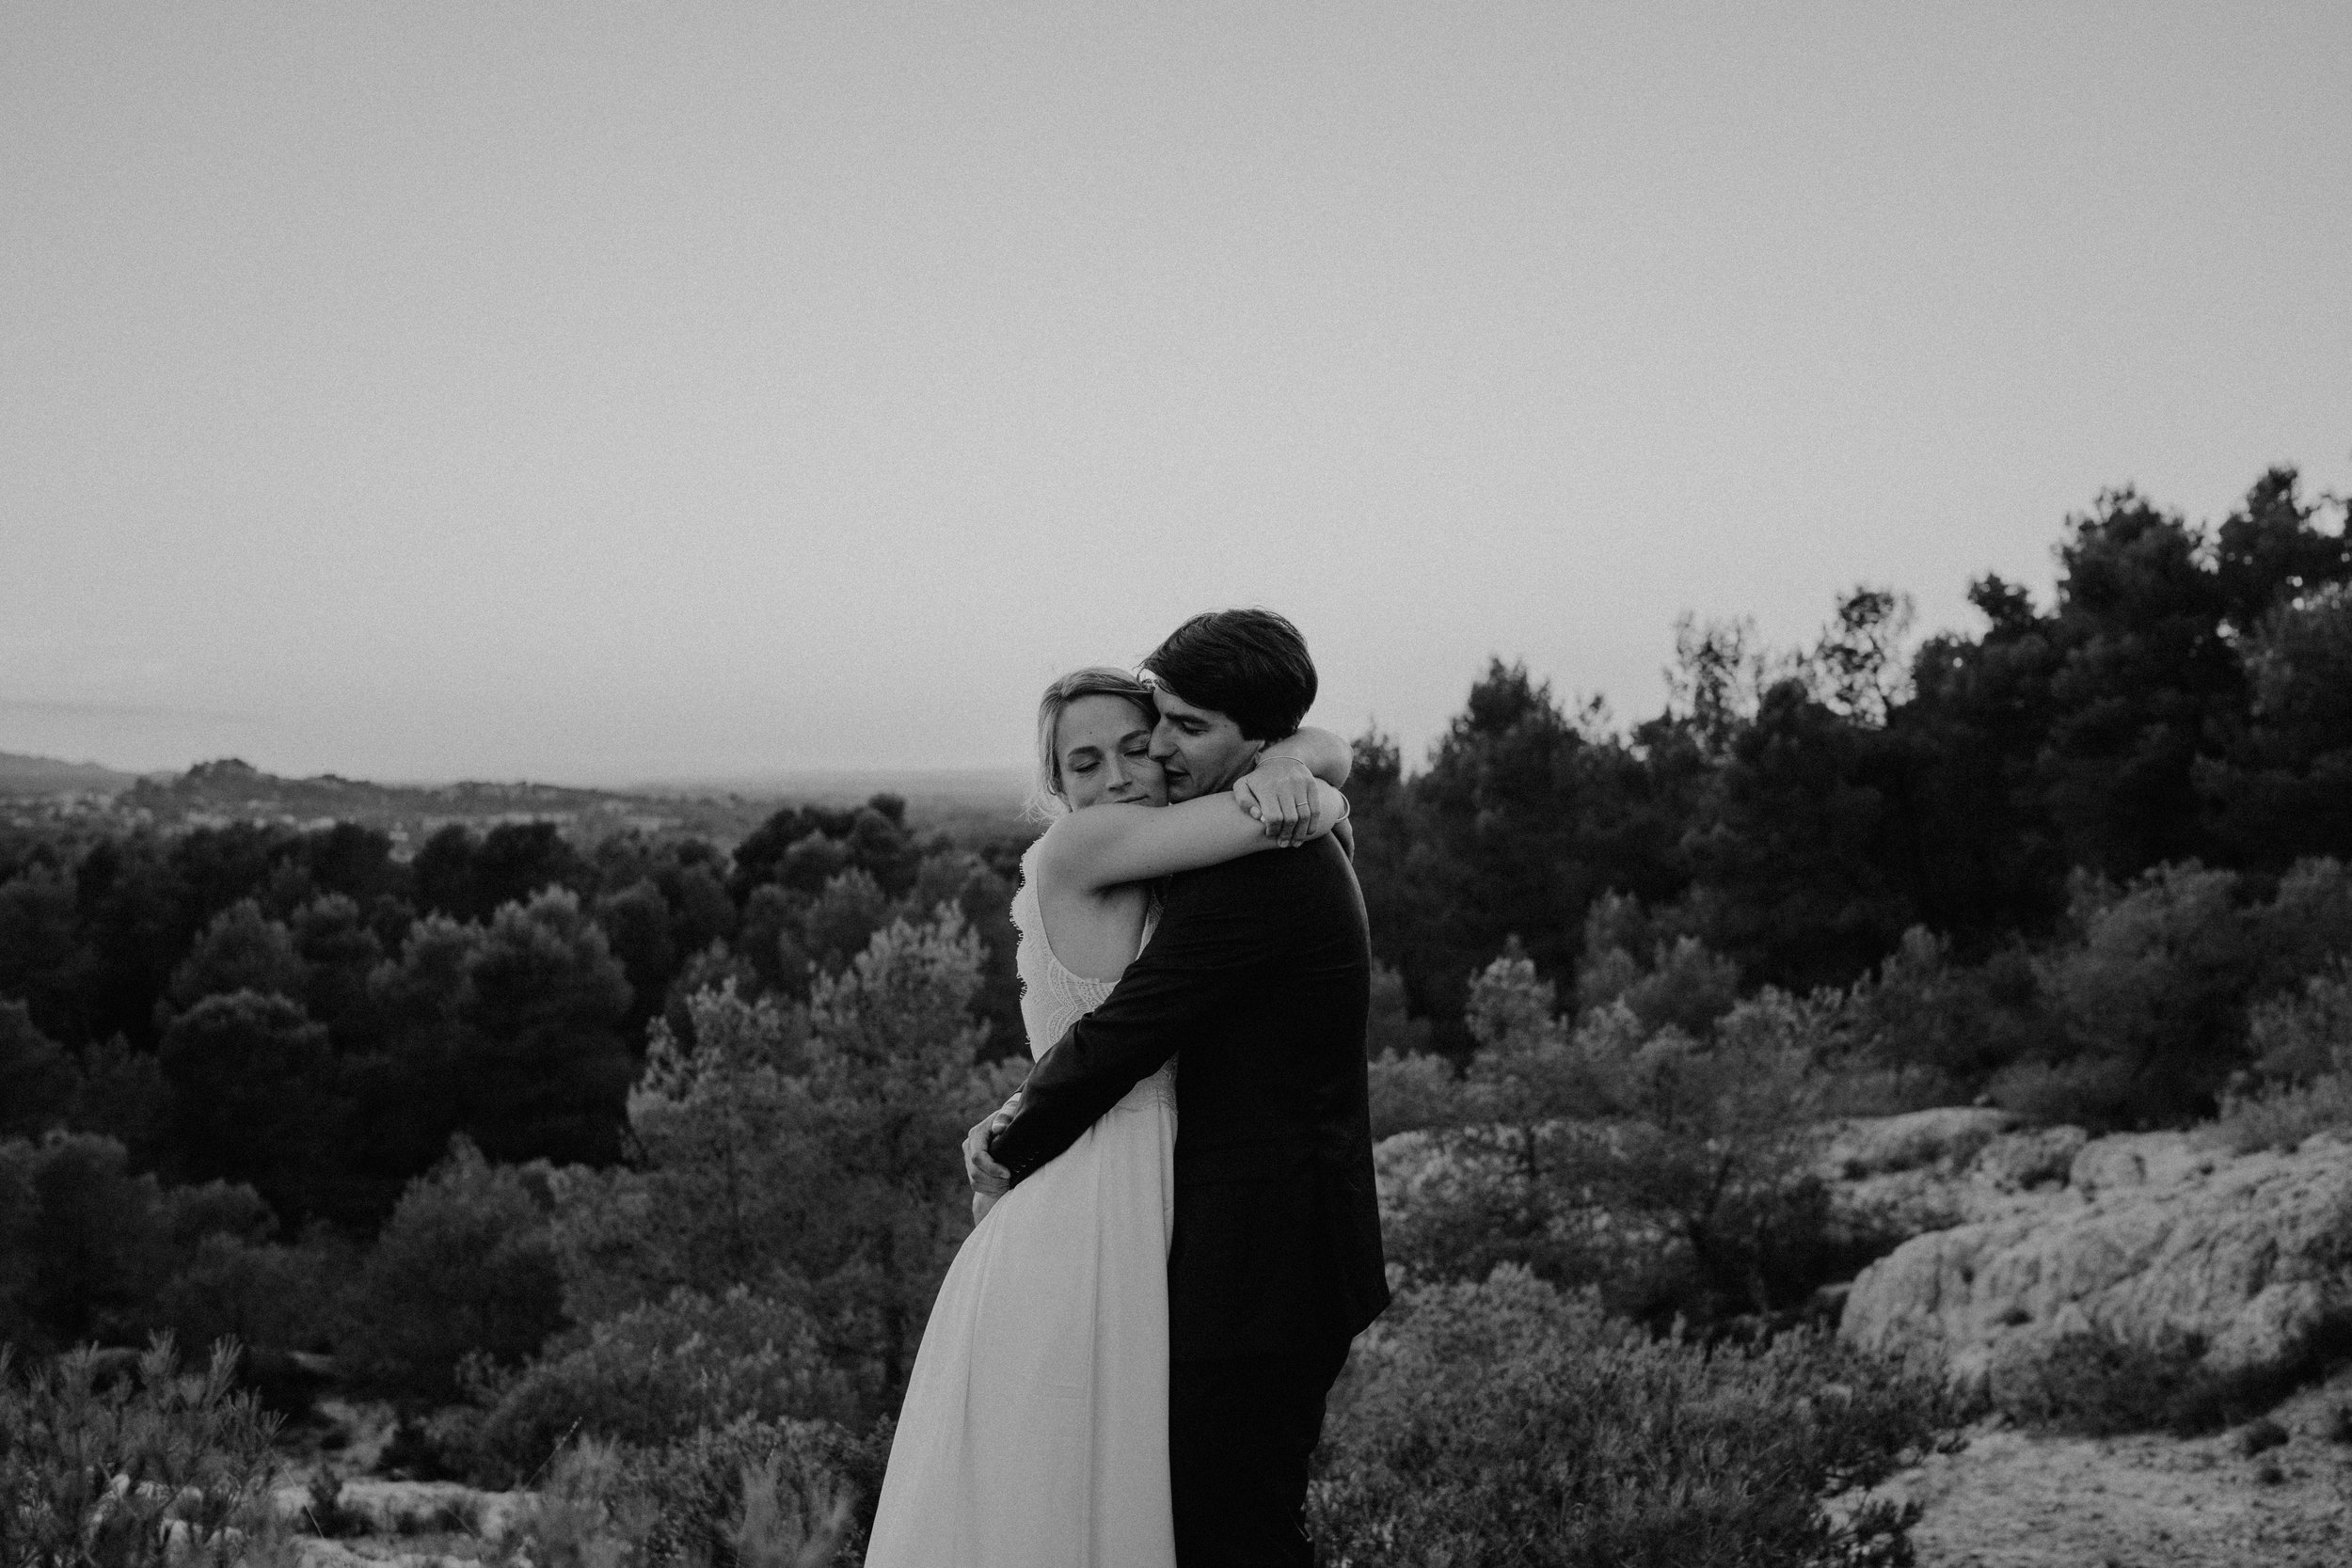 elsacaza_photographe_mariage_Juliette_Nicolas-1065.jpg